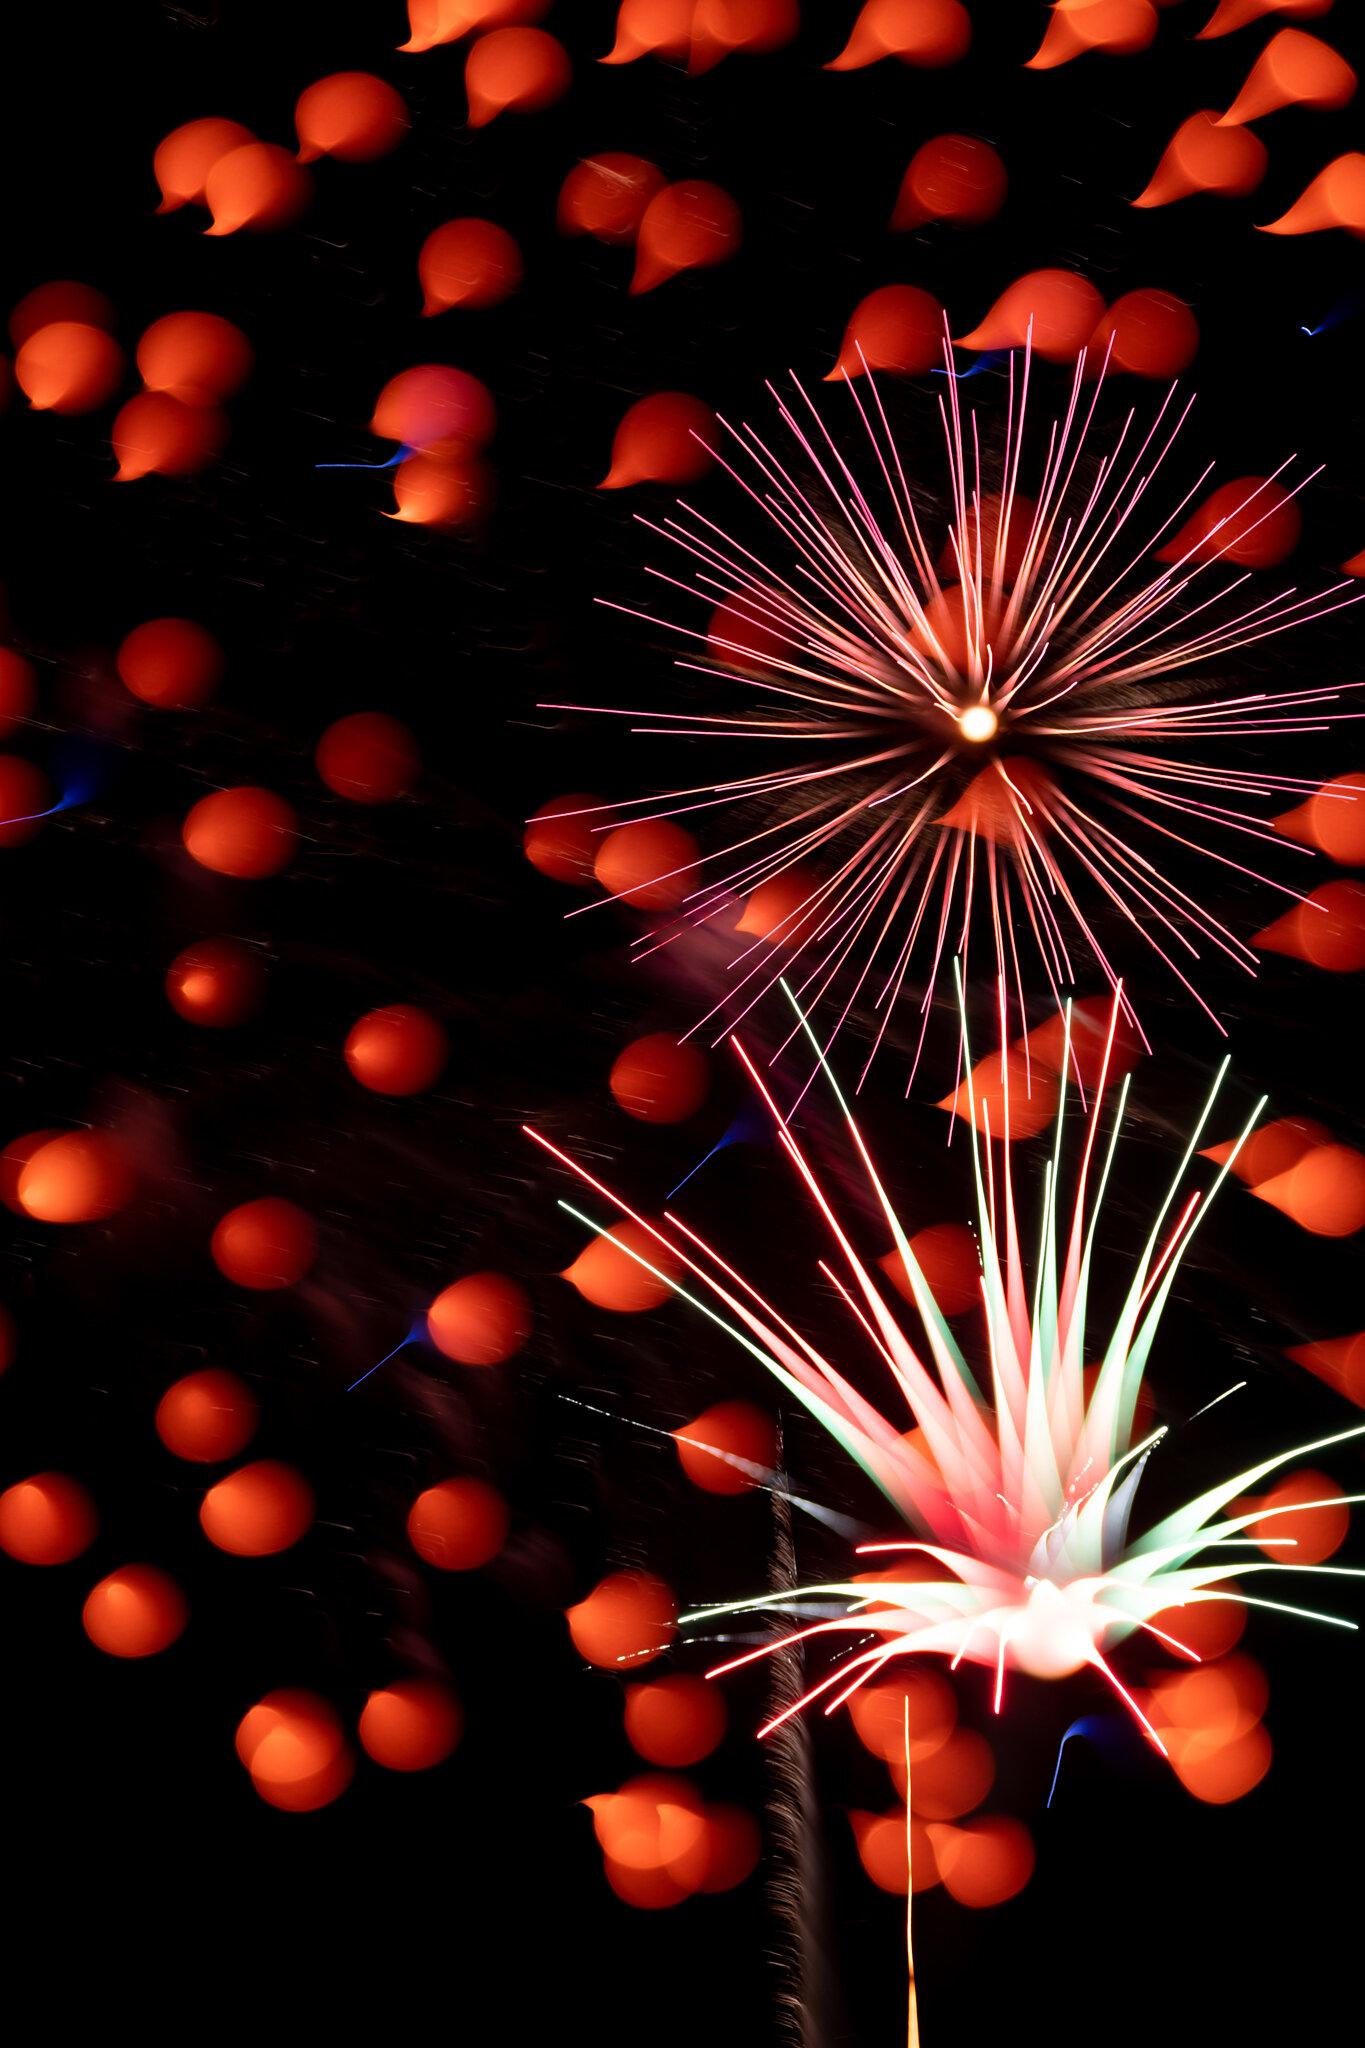 focuspulledfireworks-10.jpg